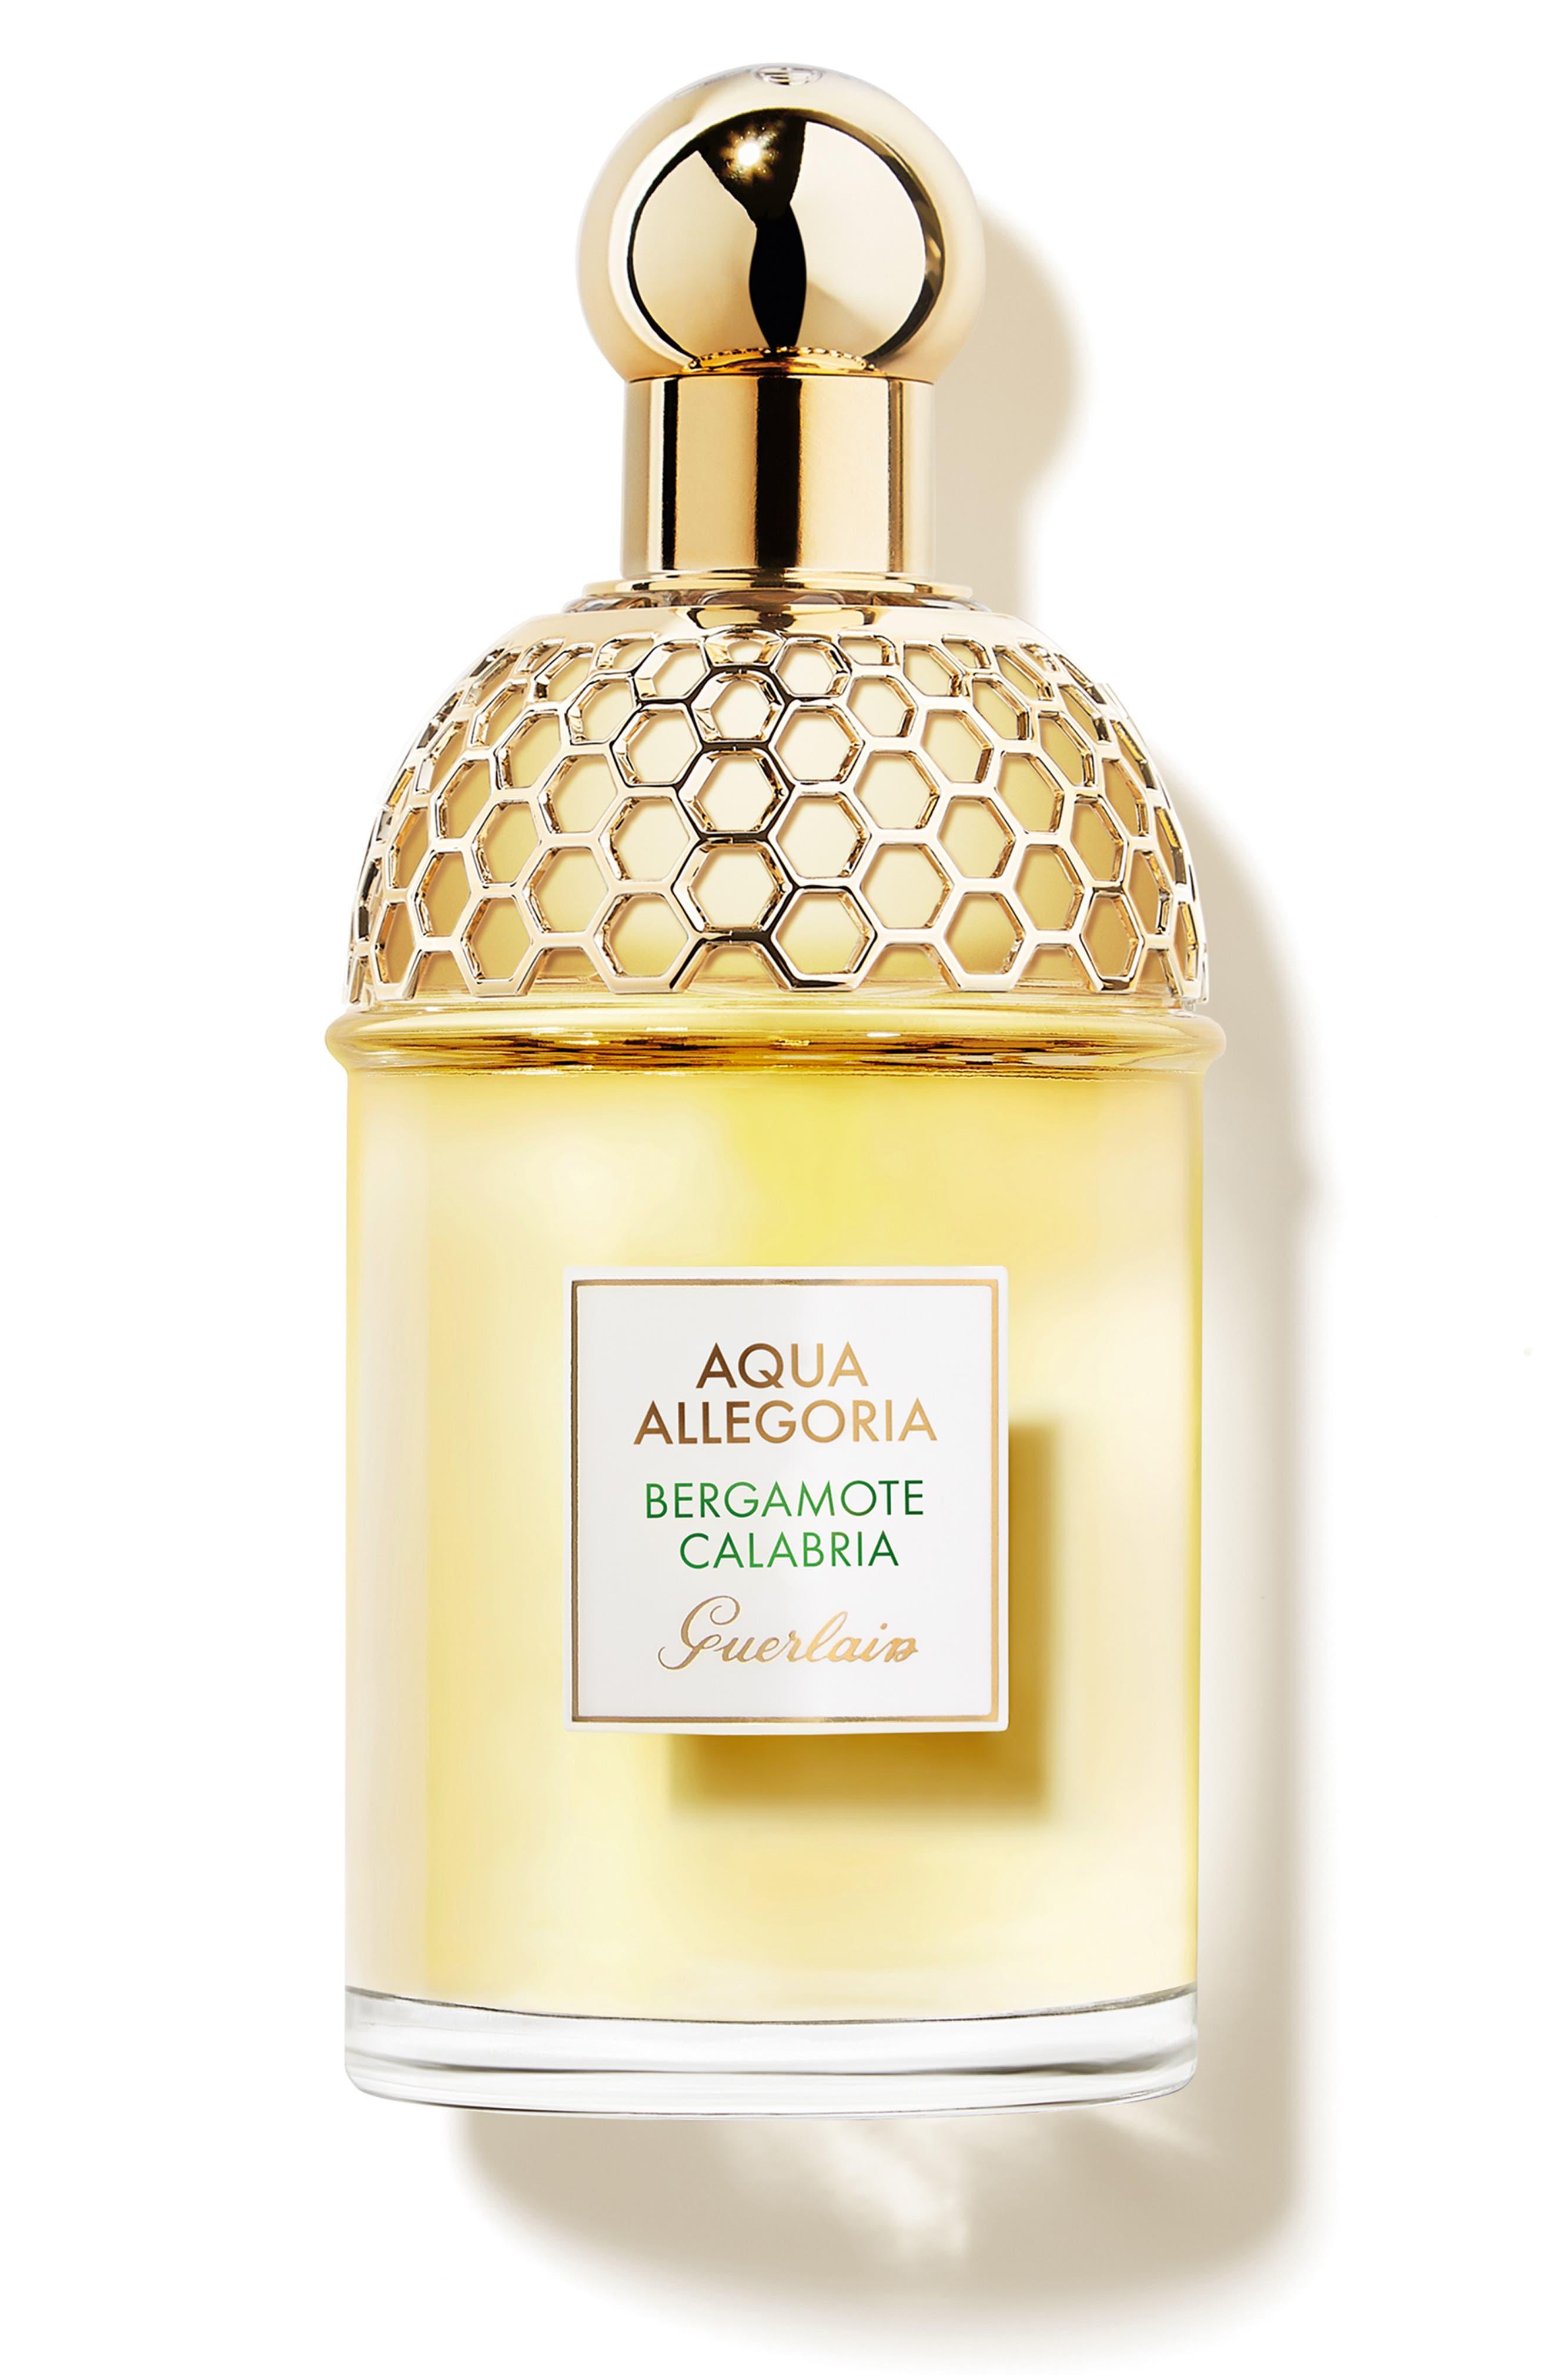 Aqua Allegoria Bergamote Calabria Eau De Toilette